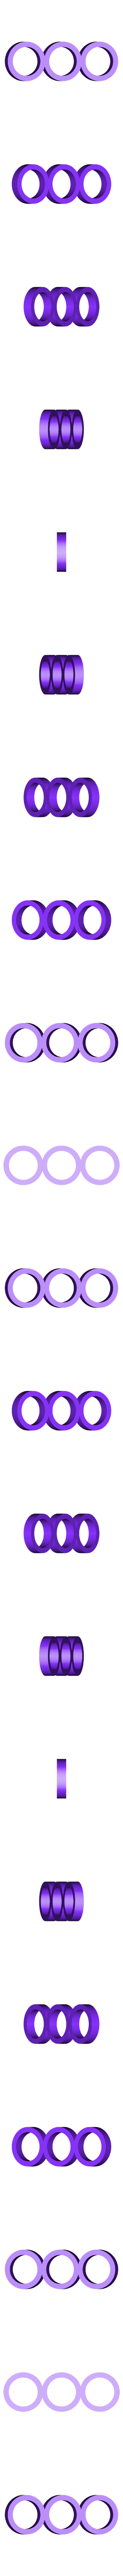 Three_Ring_Spinner.stl Download free STL file Three Ring Spinner • 3D printable model, Desktop_Makes